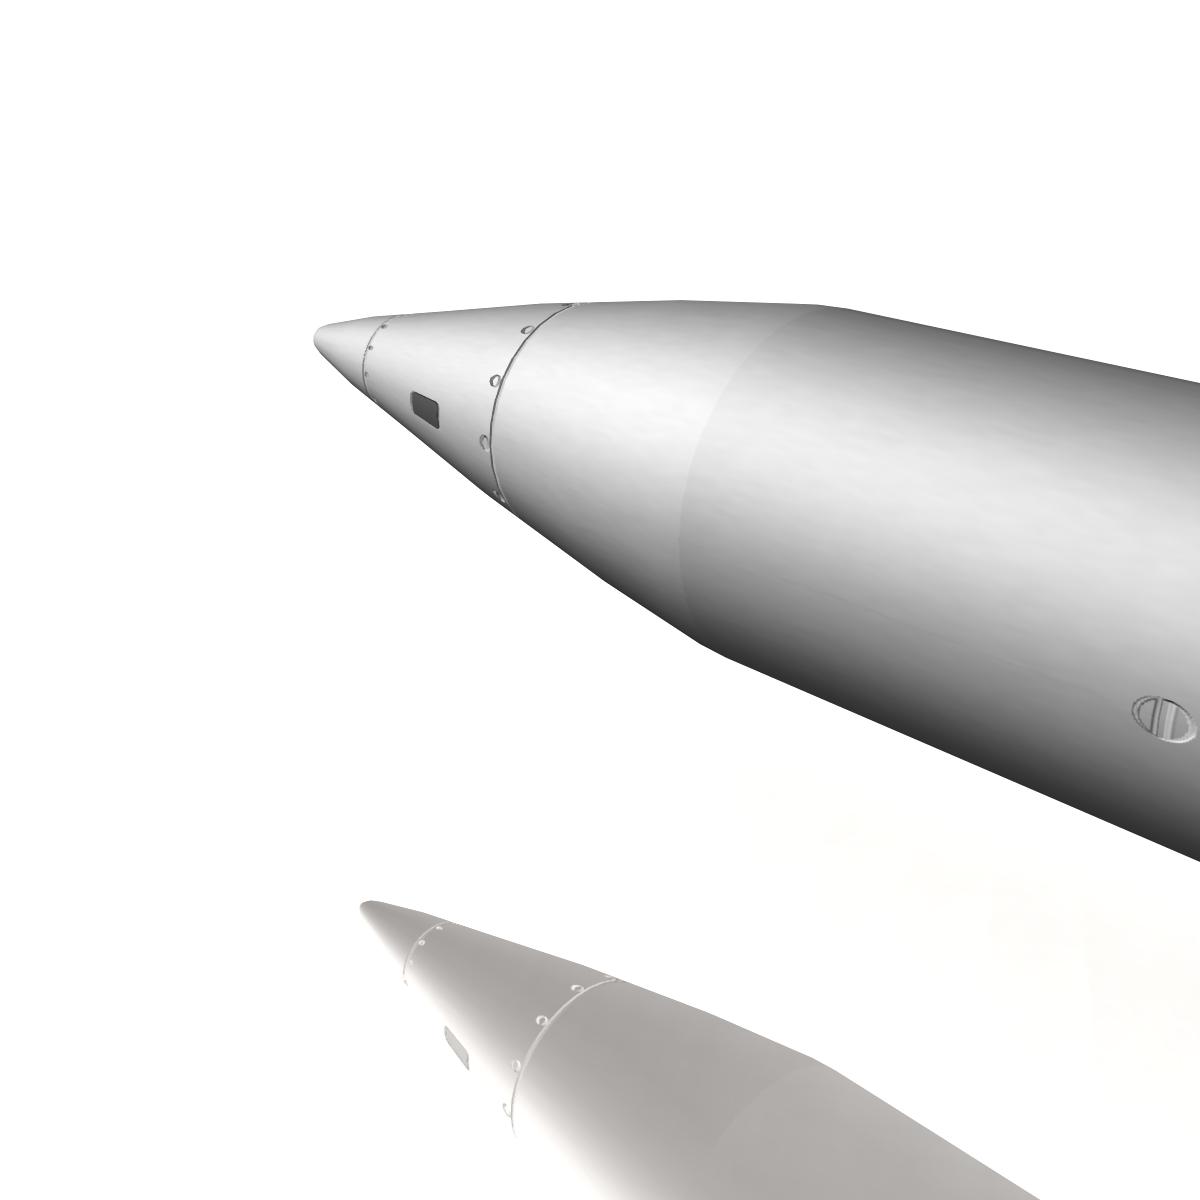 БНХАУ-ын С-400 пуужин 3d загвар 3ds dxf cob x obj 157962